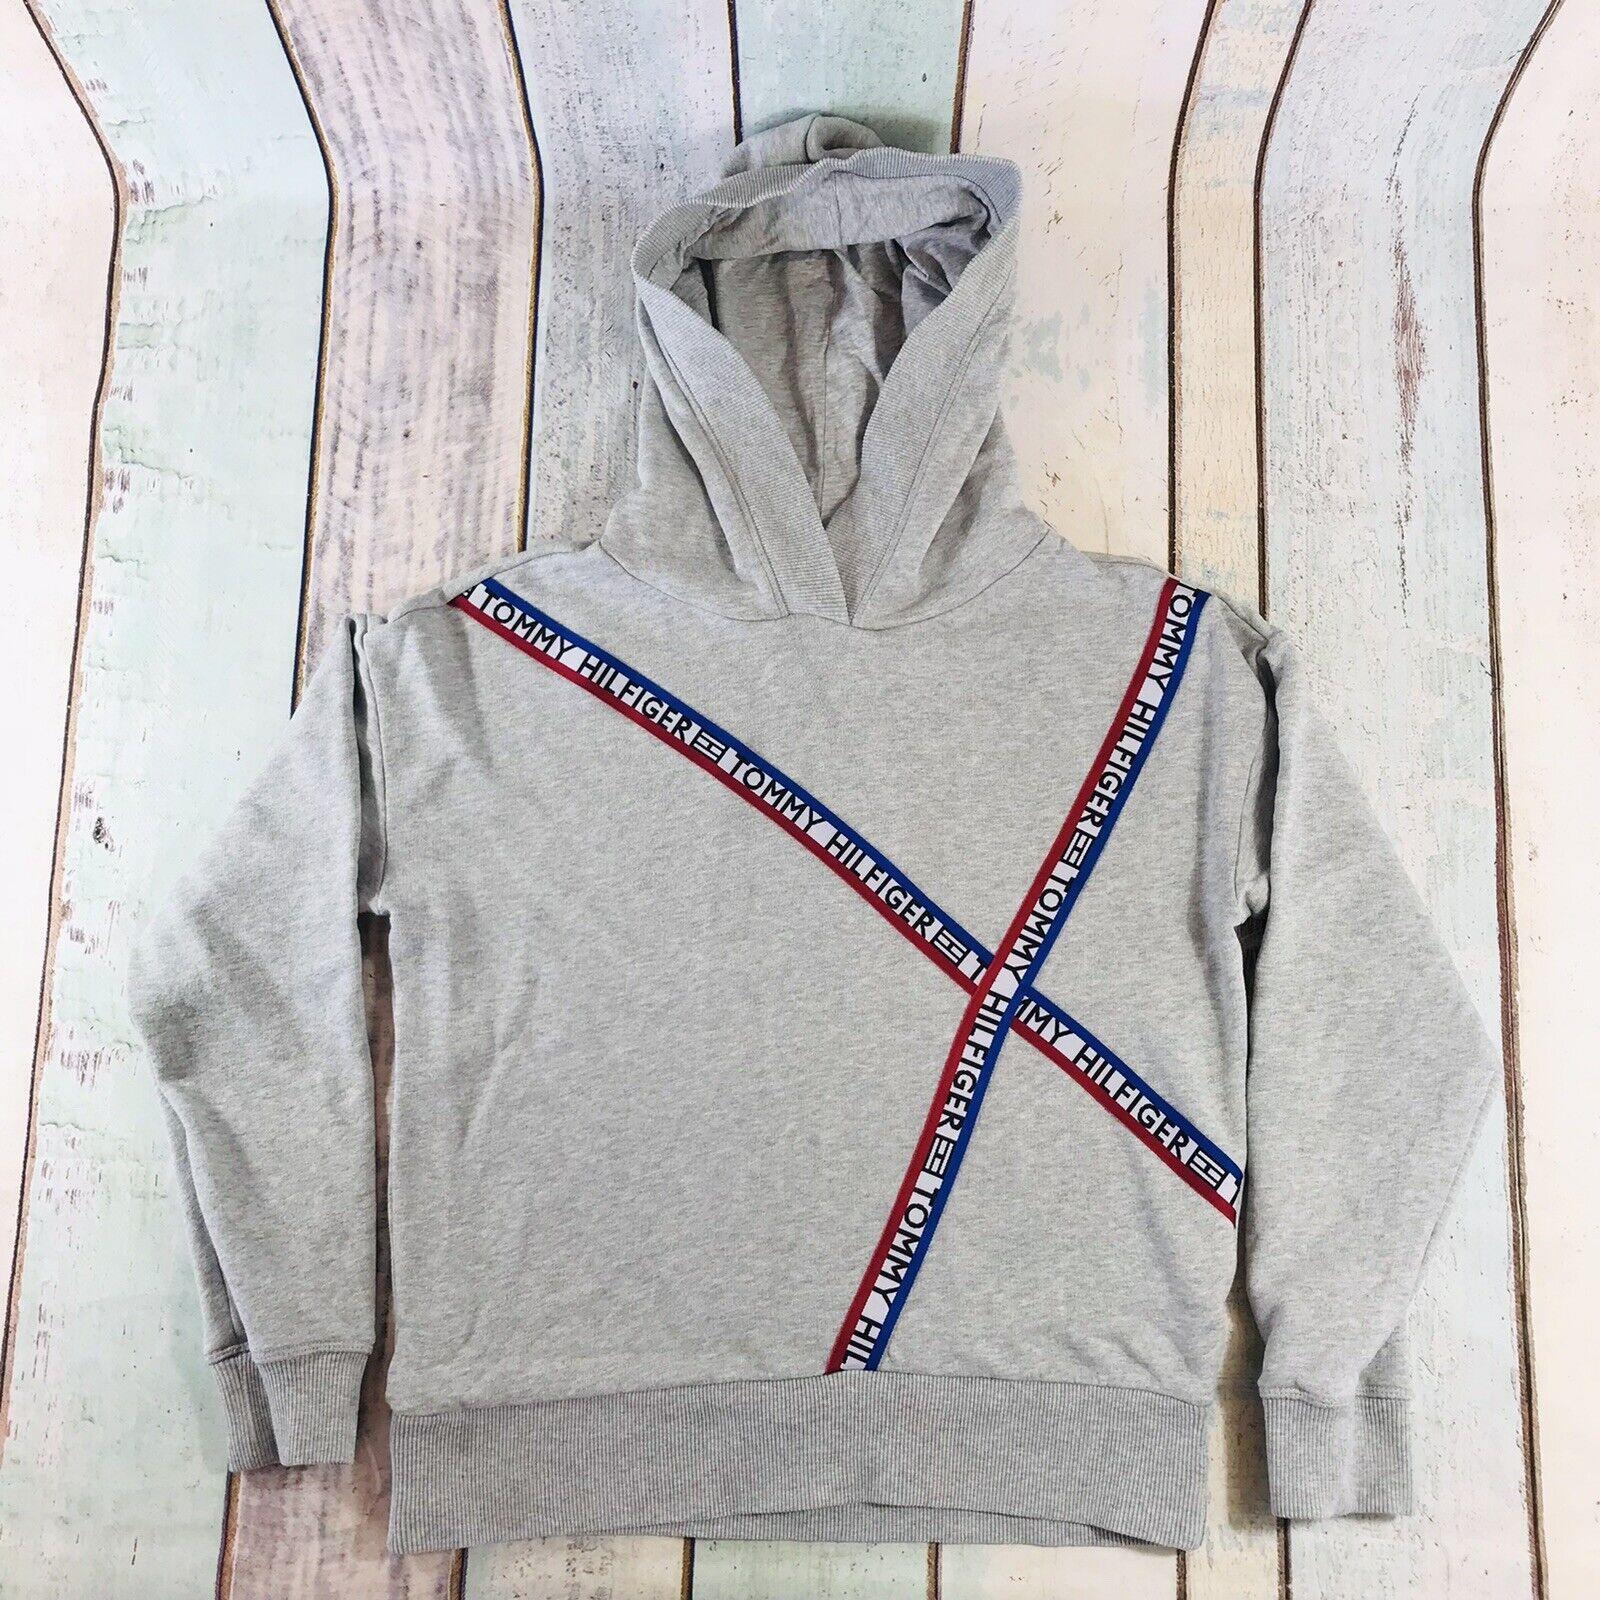 Tommy Hilfiger Womens Hoodie Sweatshirt Jumper Pullover Grey Spellout M Medium